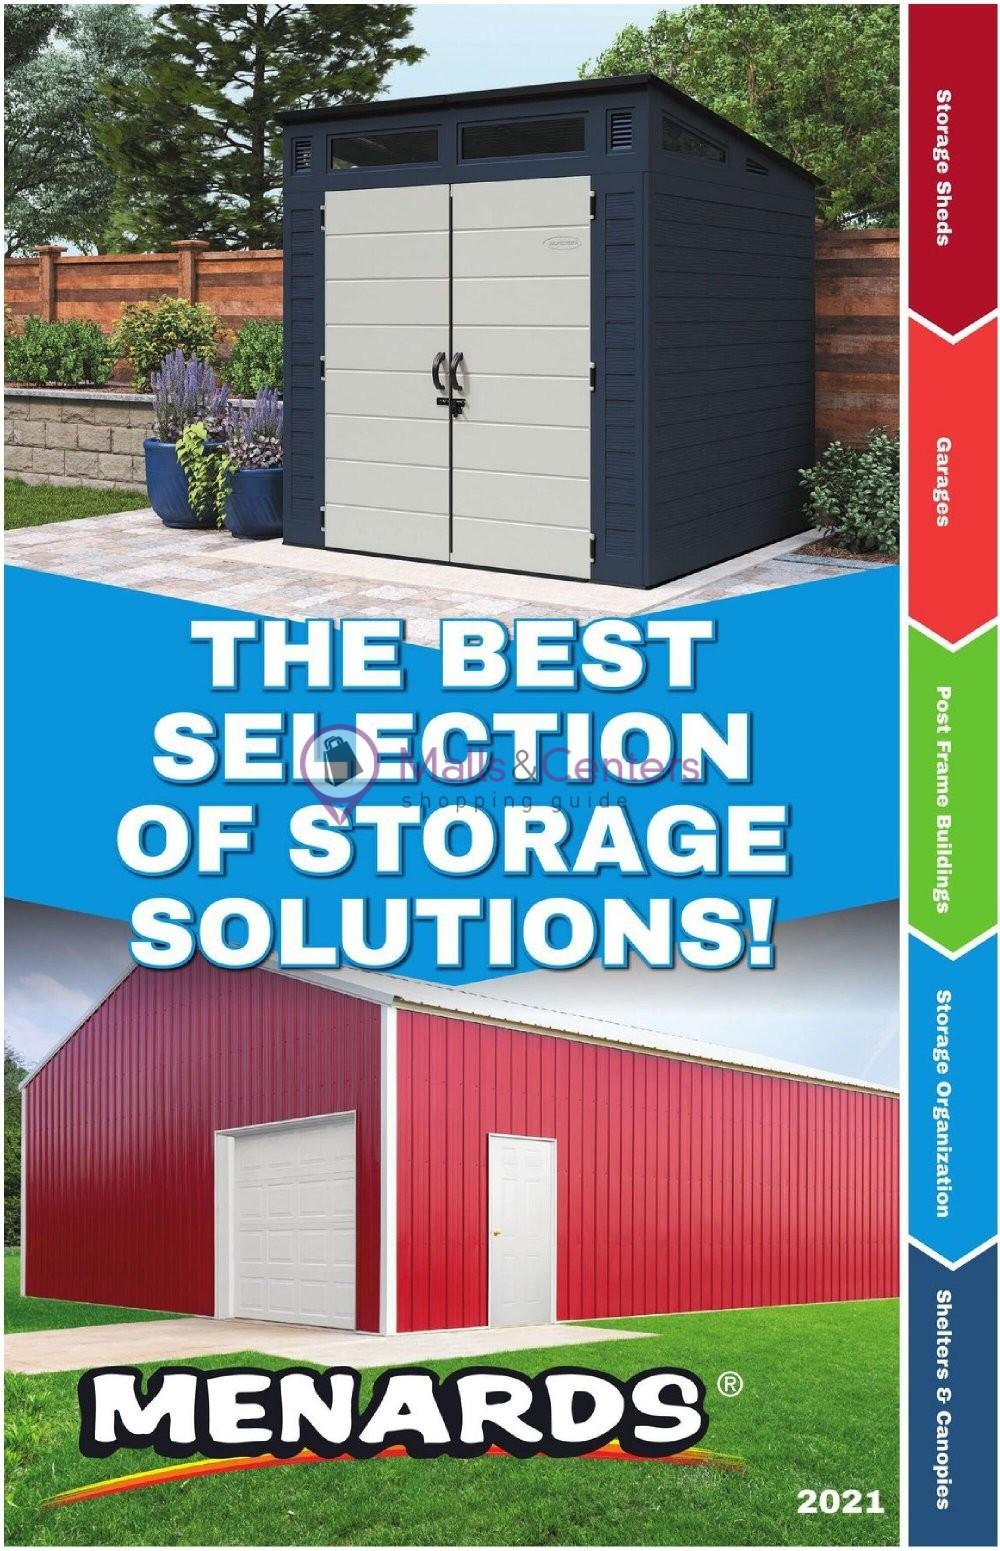 weekly ads Menards - page 1 - mallscenters.com